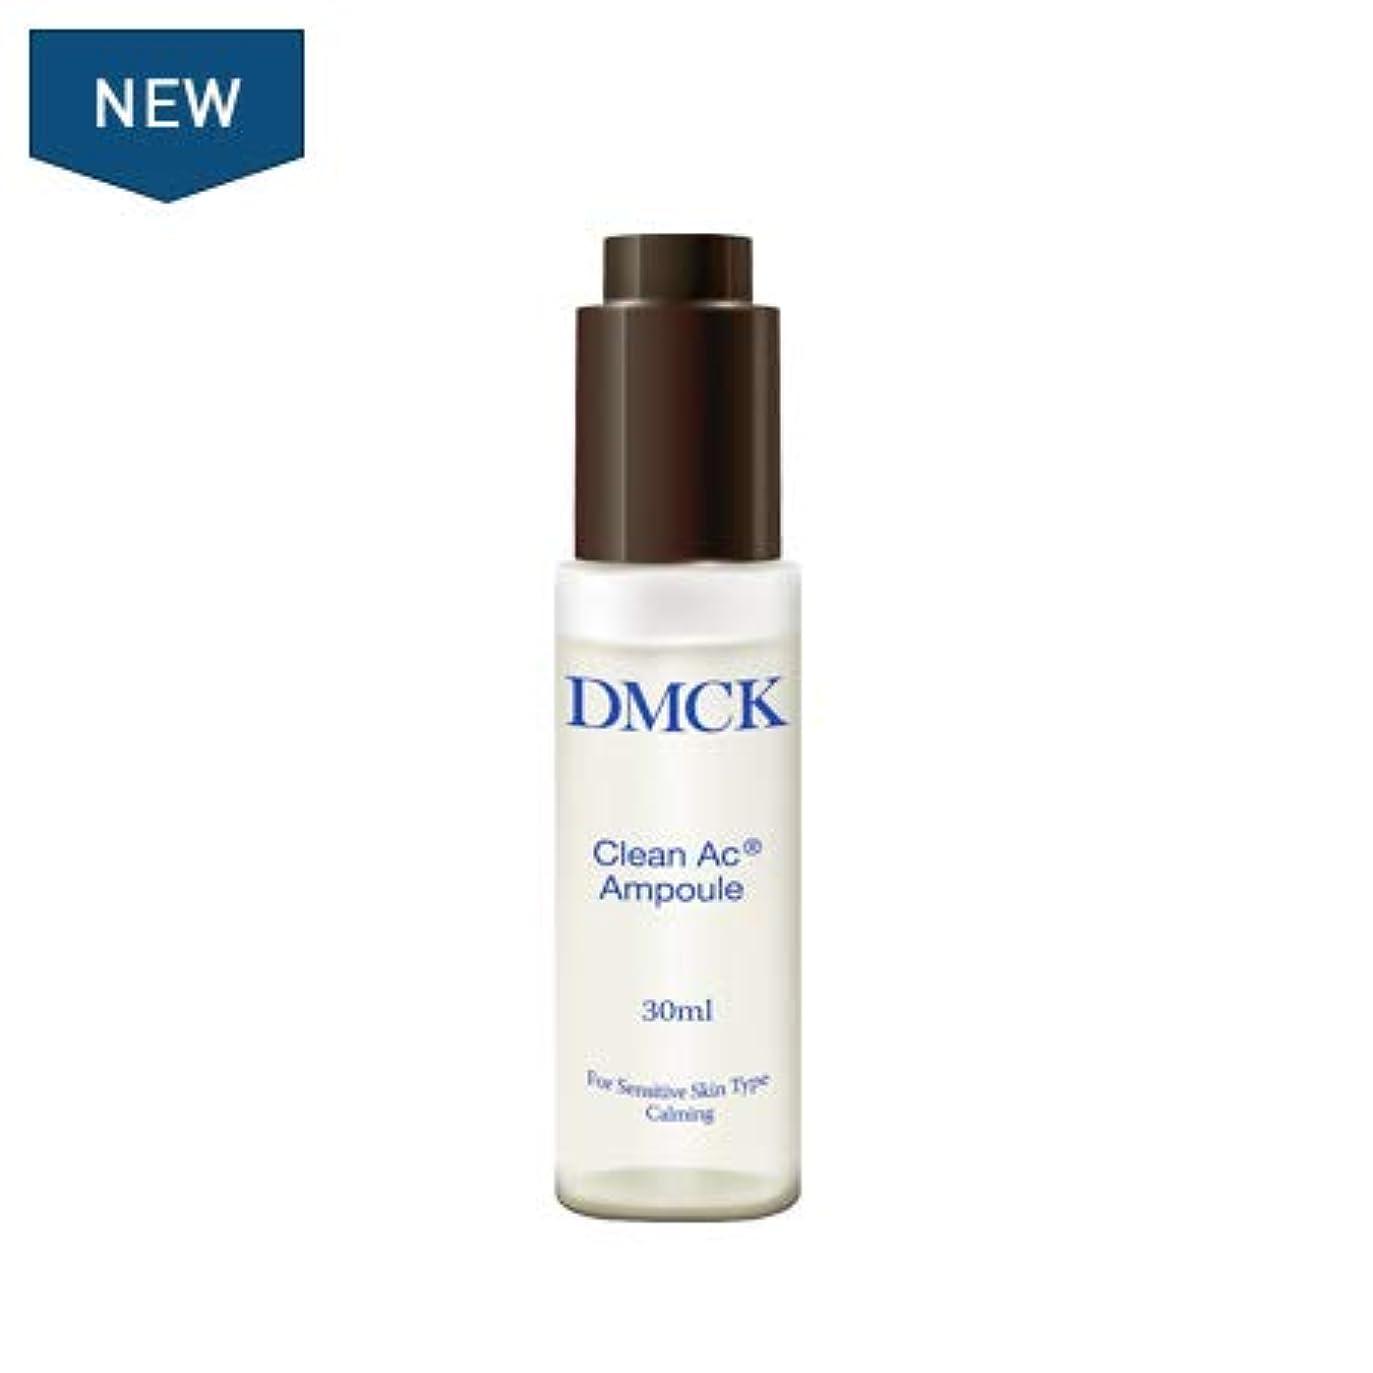 [DMCK] クリーンアークアンプル 30ml / CLEAN AC AMPOULE 30ml [並行輸入品]